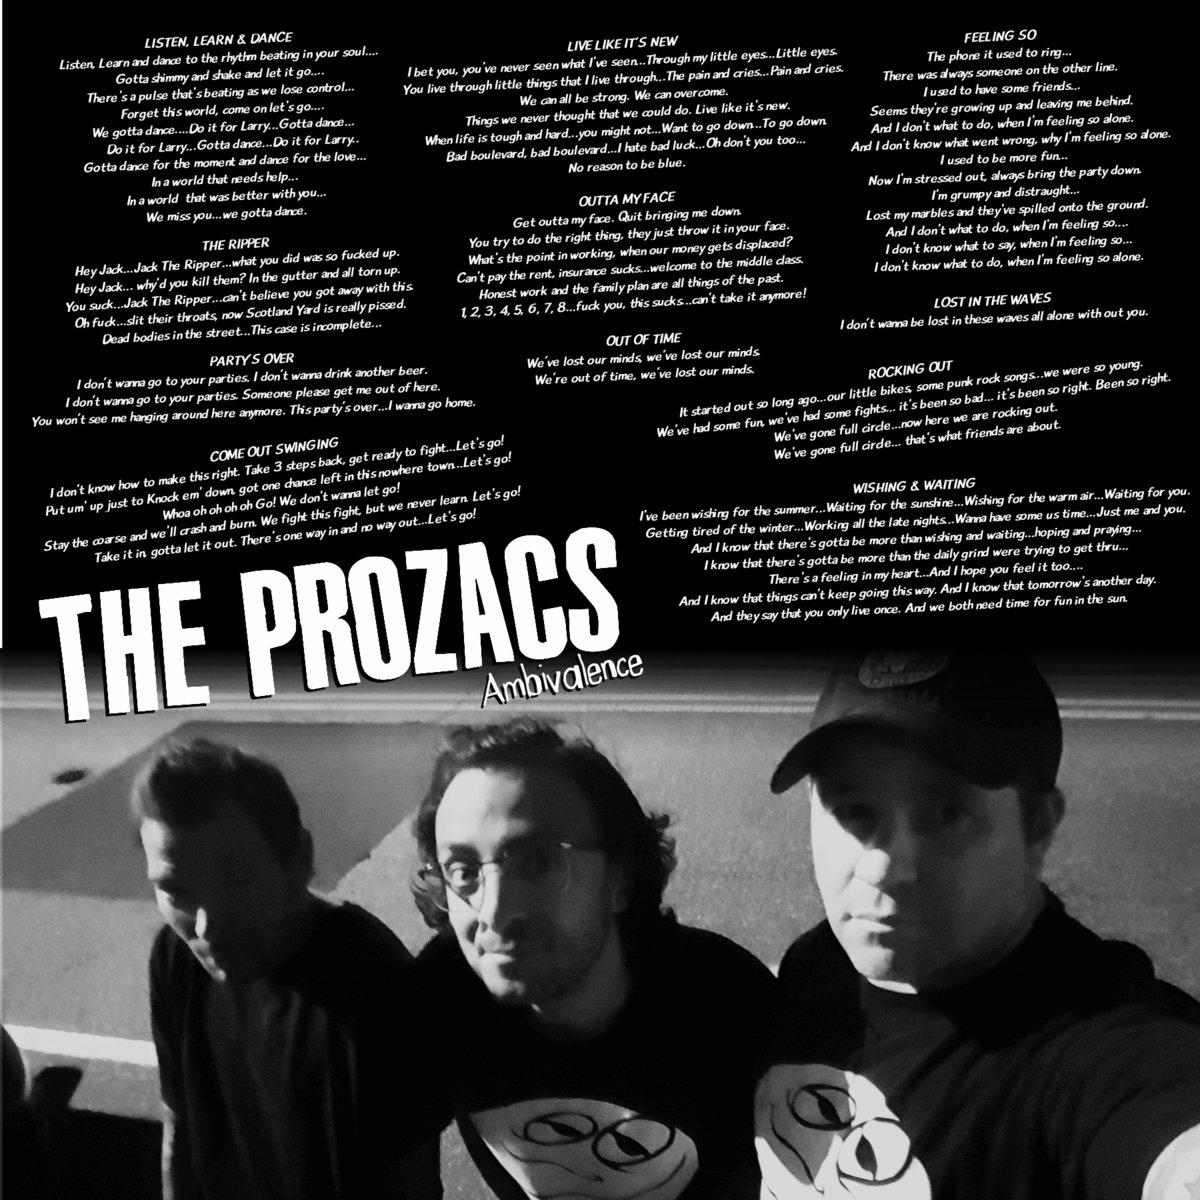 Ambivalence | The Prozacs